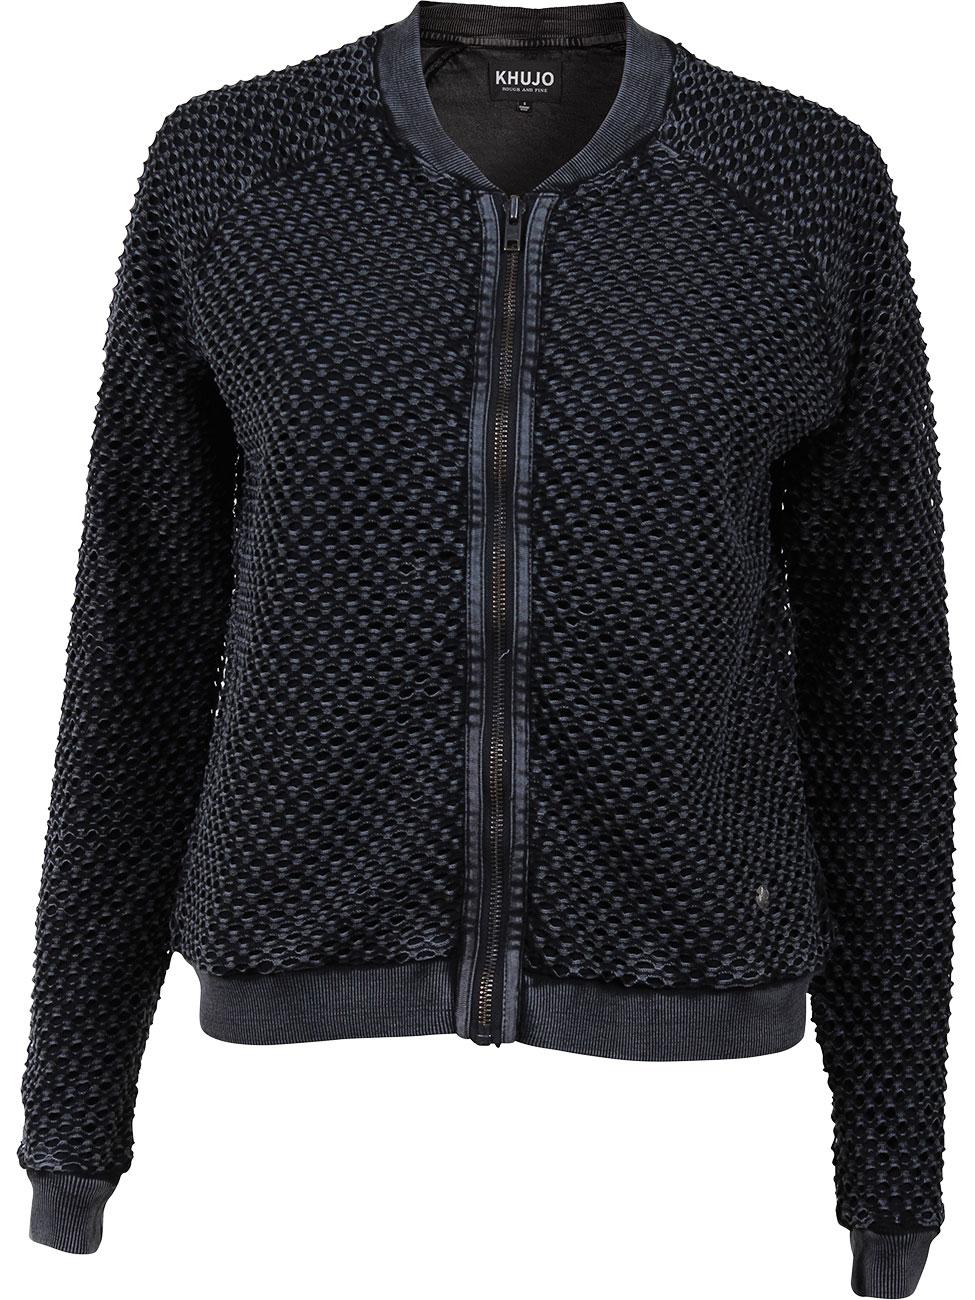 khujo strickjacke damen schwarz sweater tunic. Black Bedroom Furniture Sets. Home Design Ideas